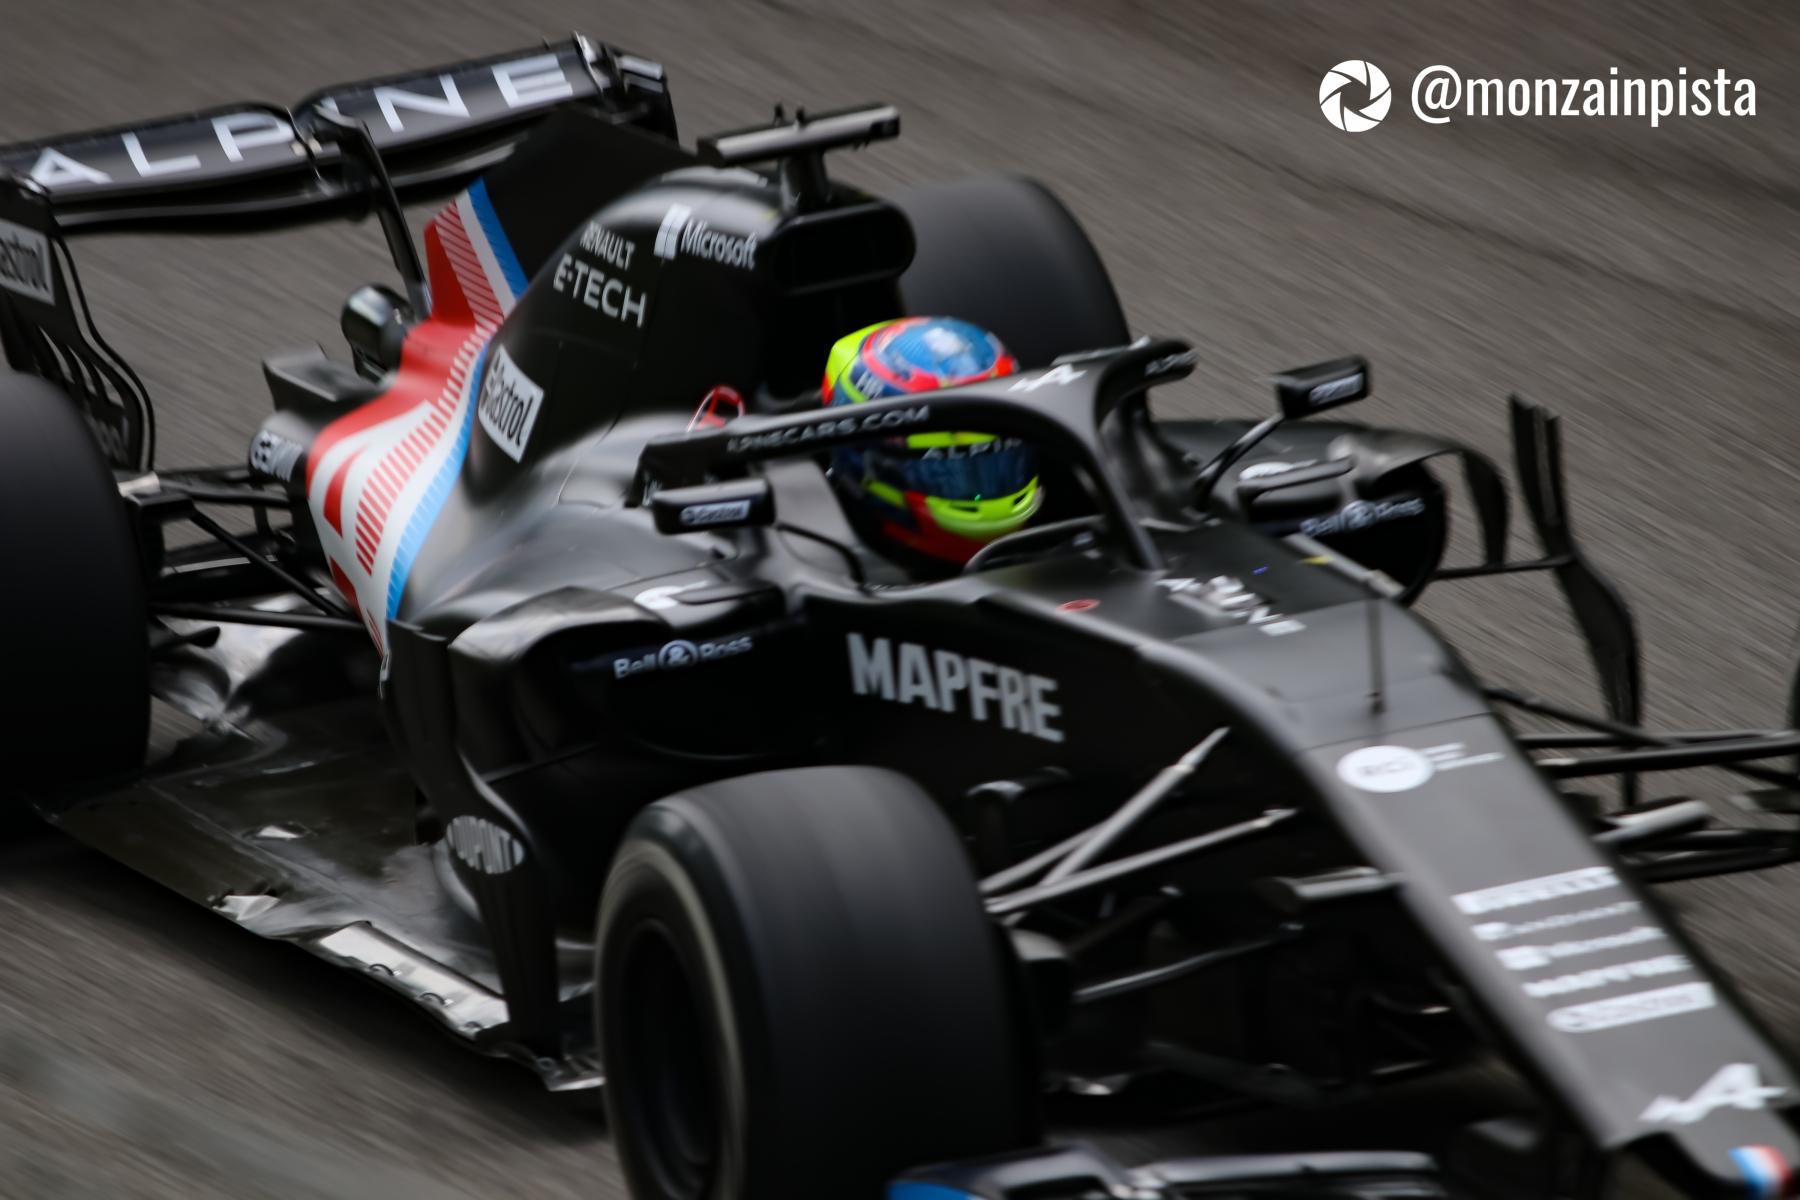 Test Alpine F1 (2 -  3 Agosto 2021)